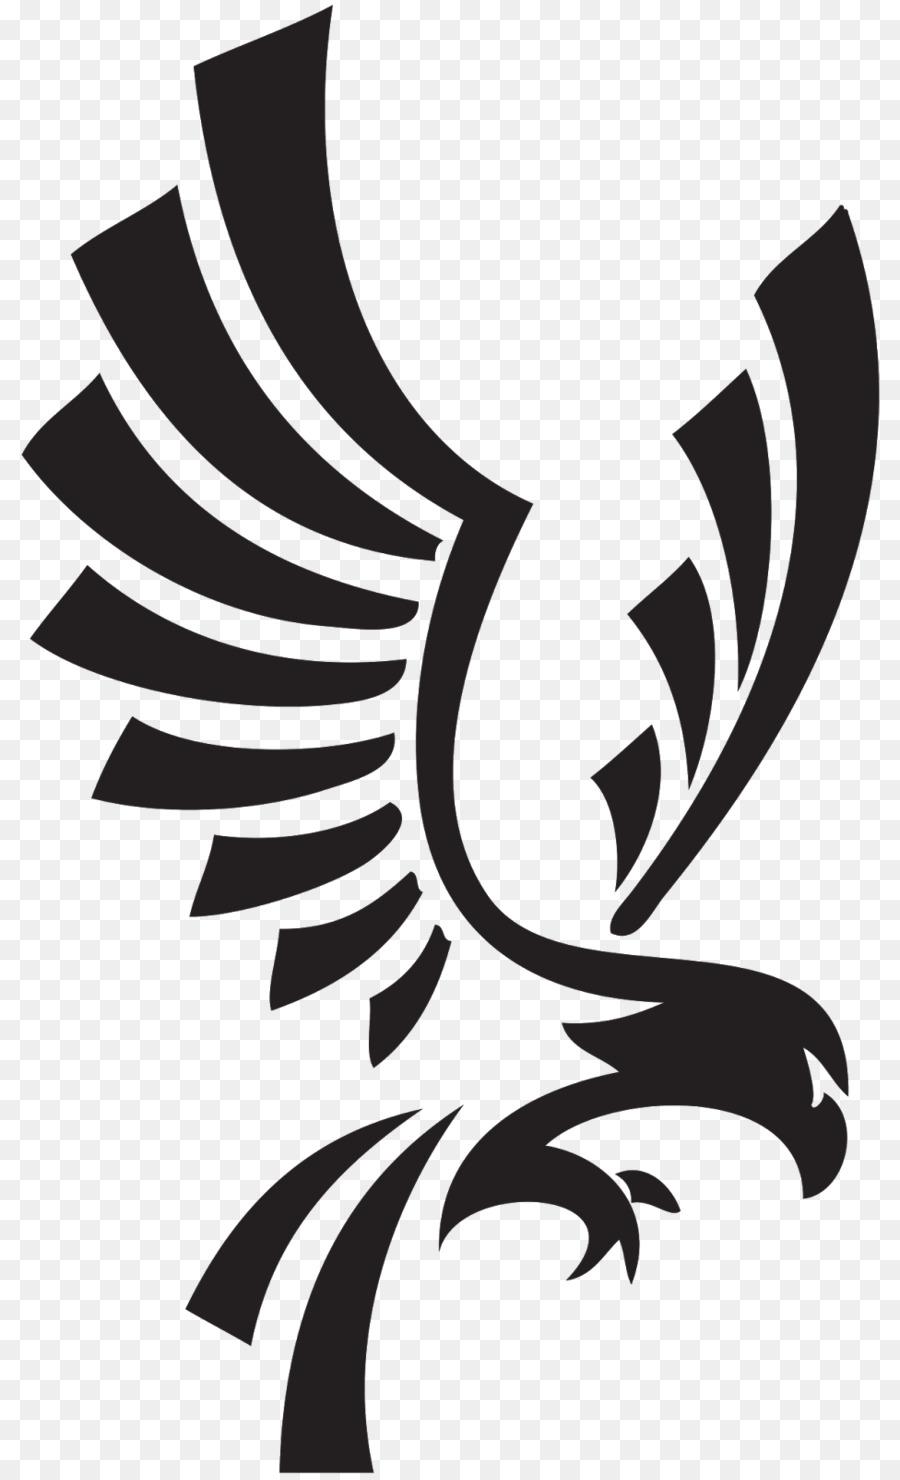 Eagle Symbol Bird Buzzard Eagle Png Download 9761600 Free